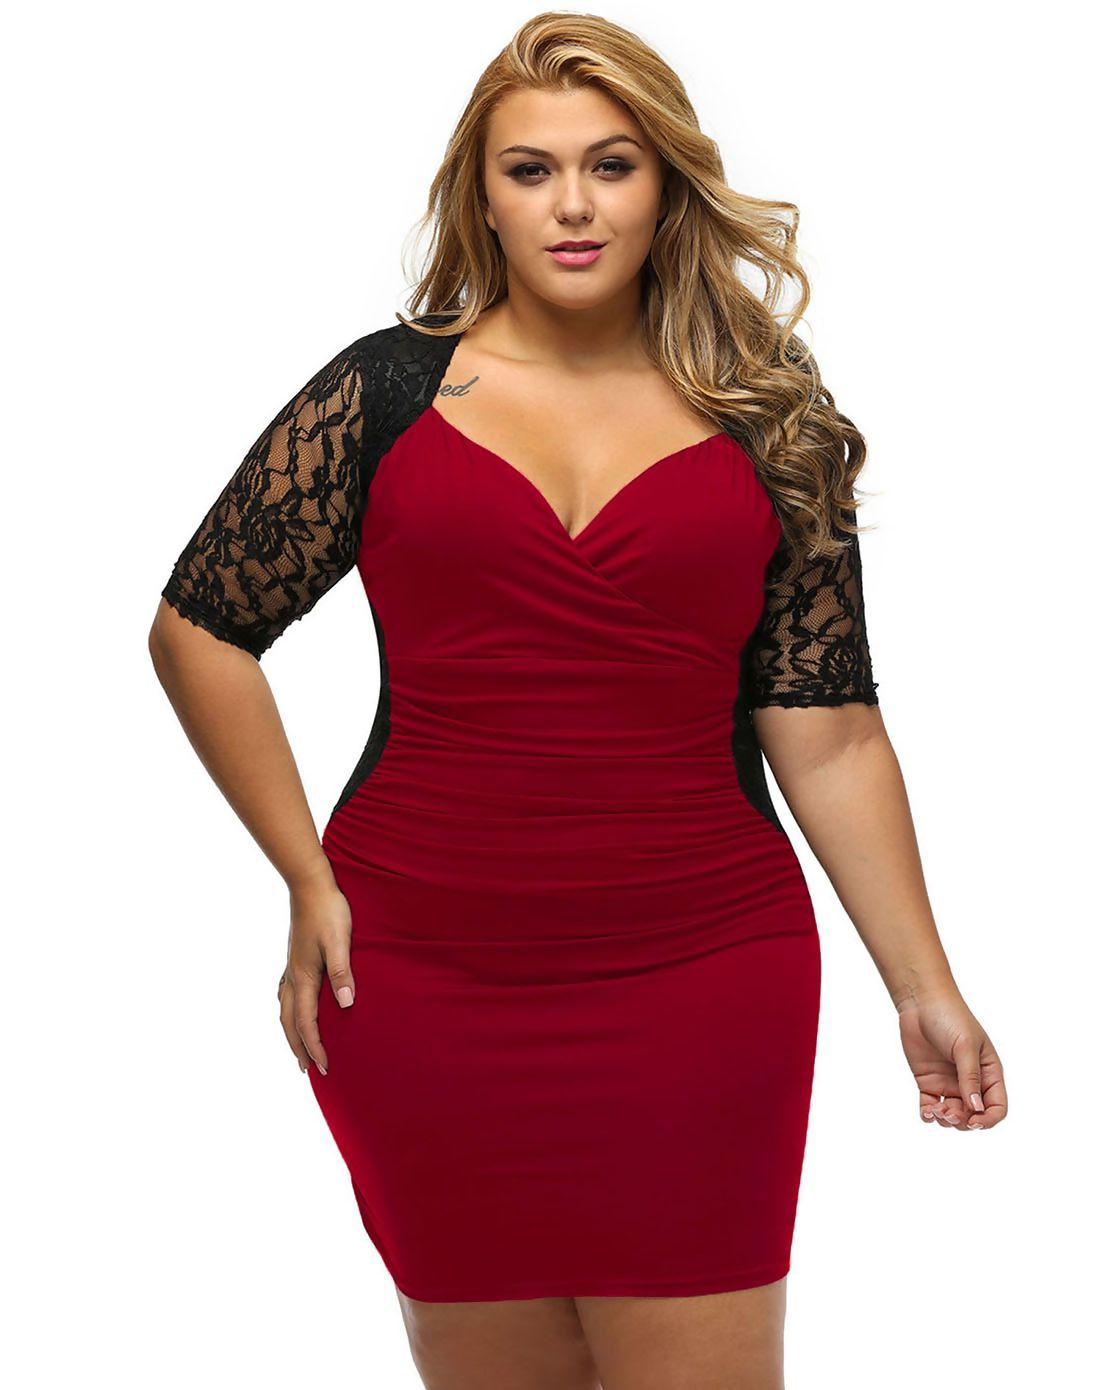 Adorewe vipme sheath dressesdesigner dear lover red colorblock